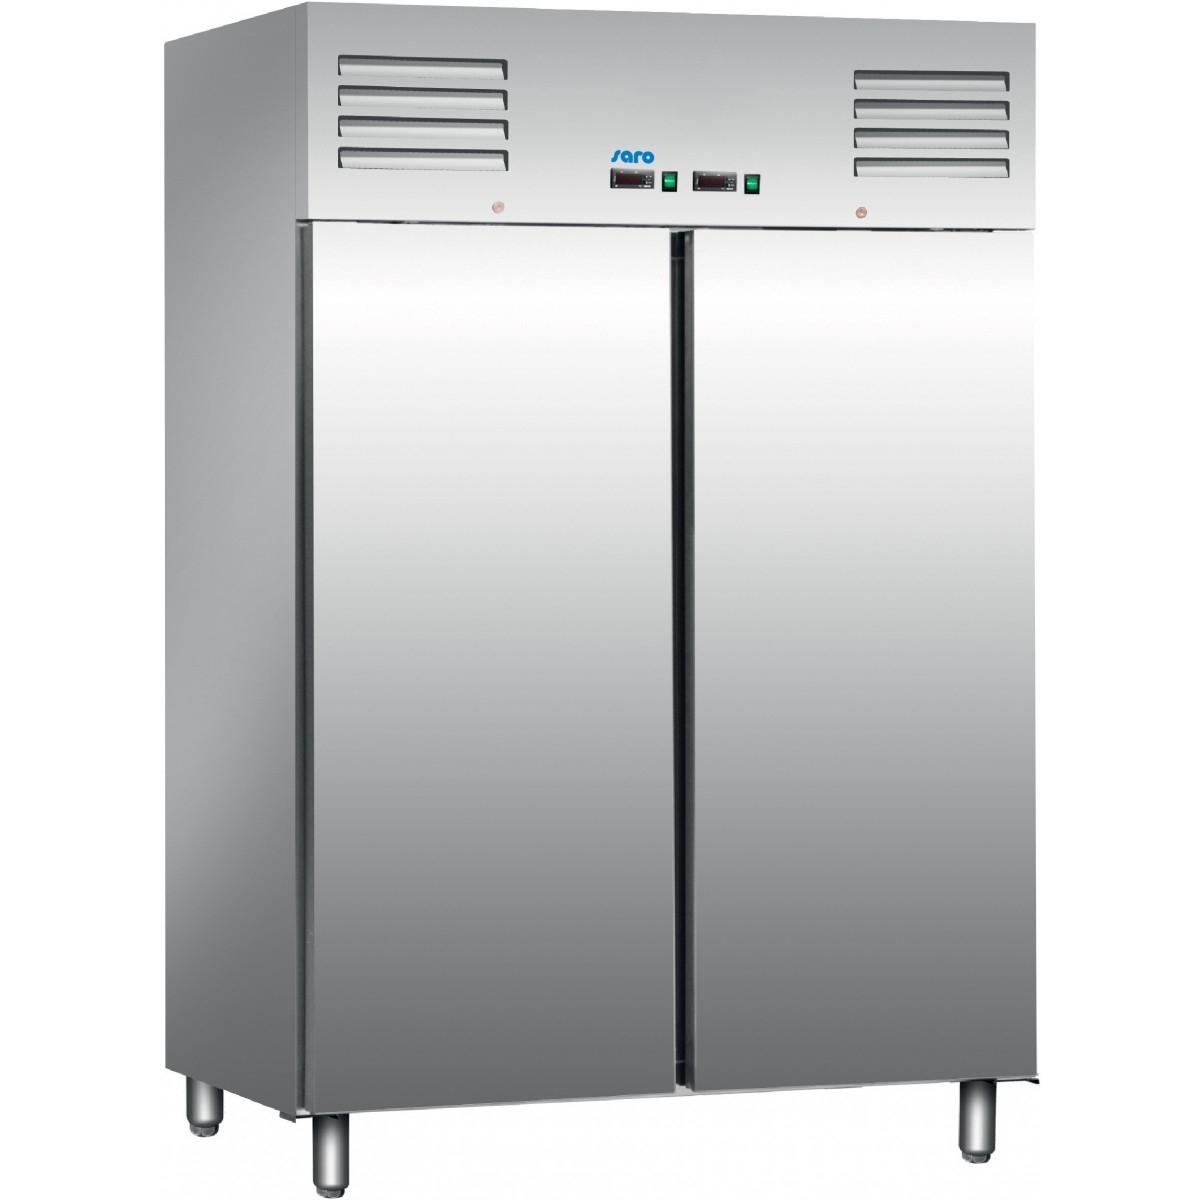 Fritstående rustfri stål køleskab dobbelt låge